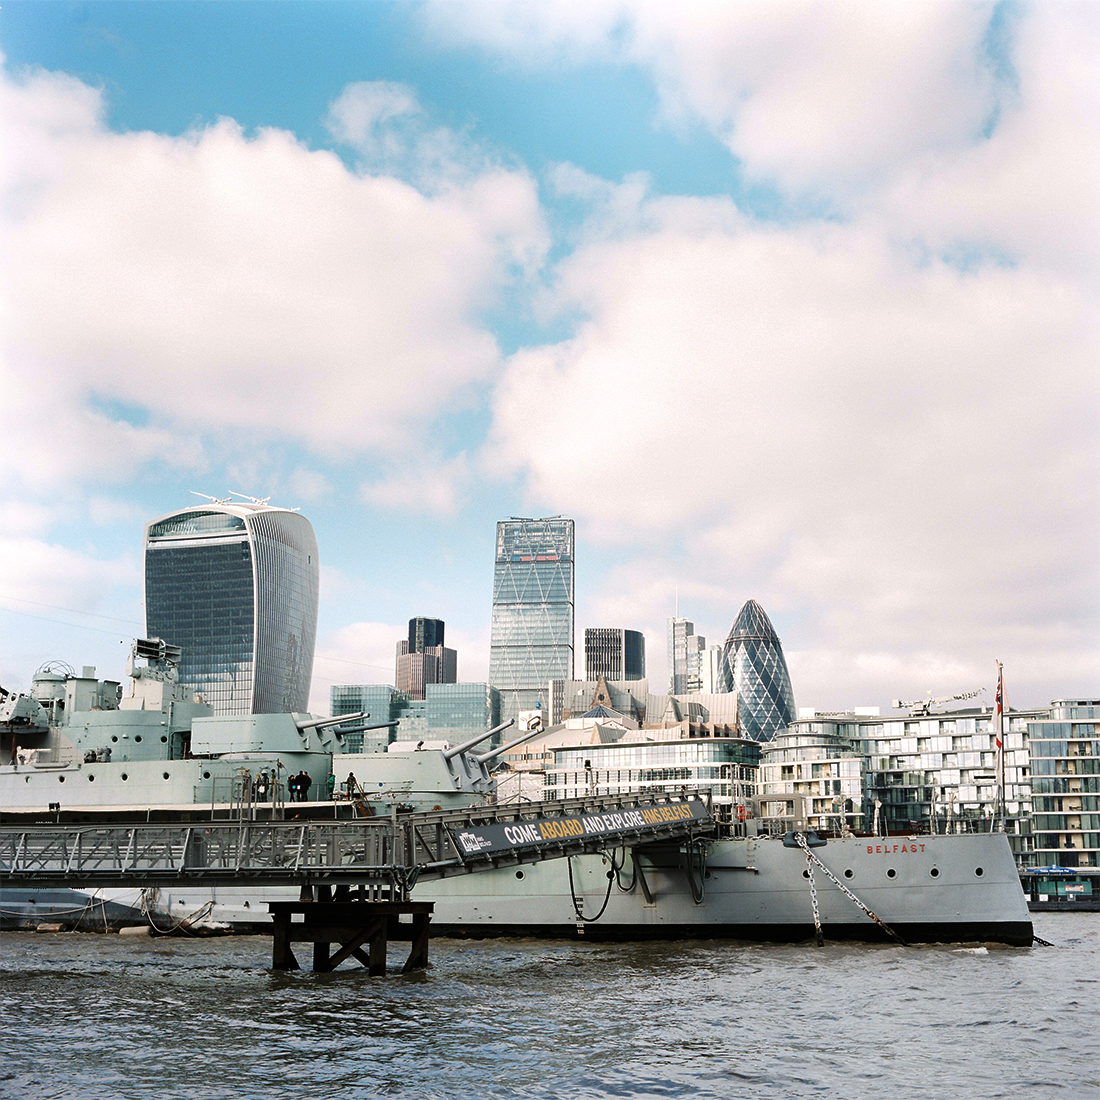 Battleship Belfast